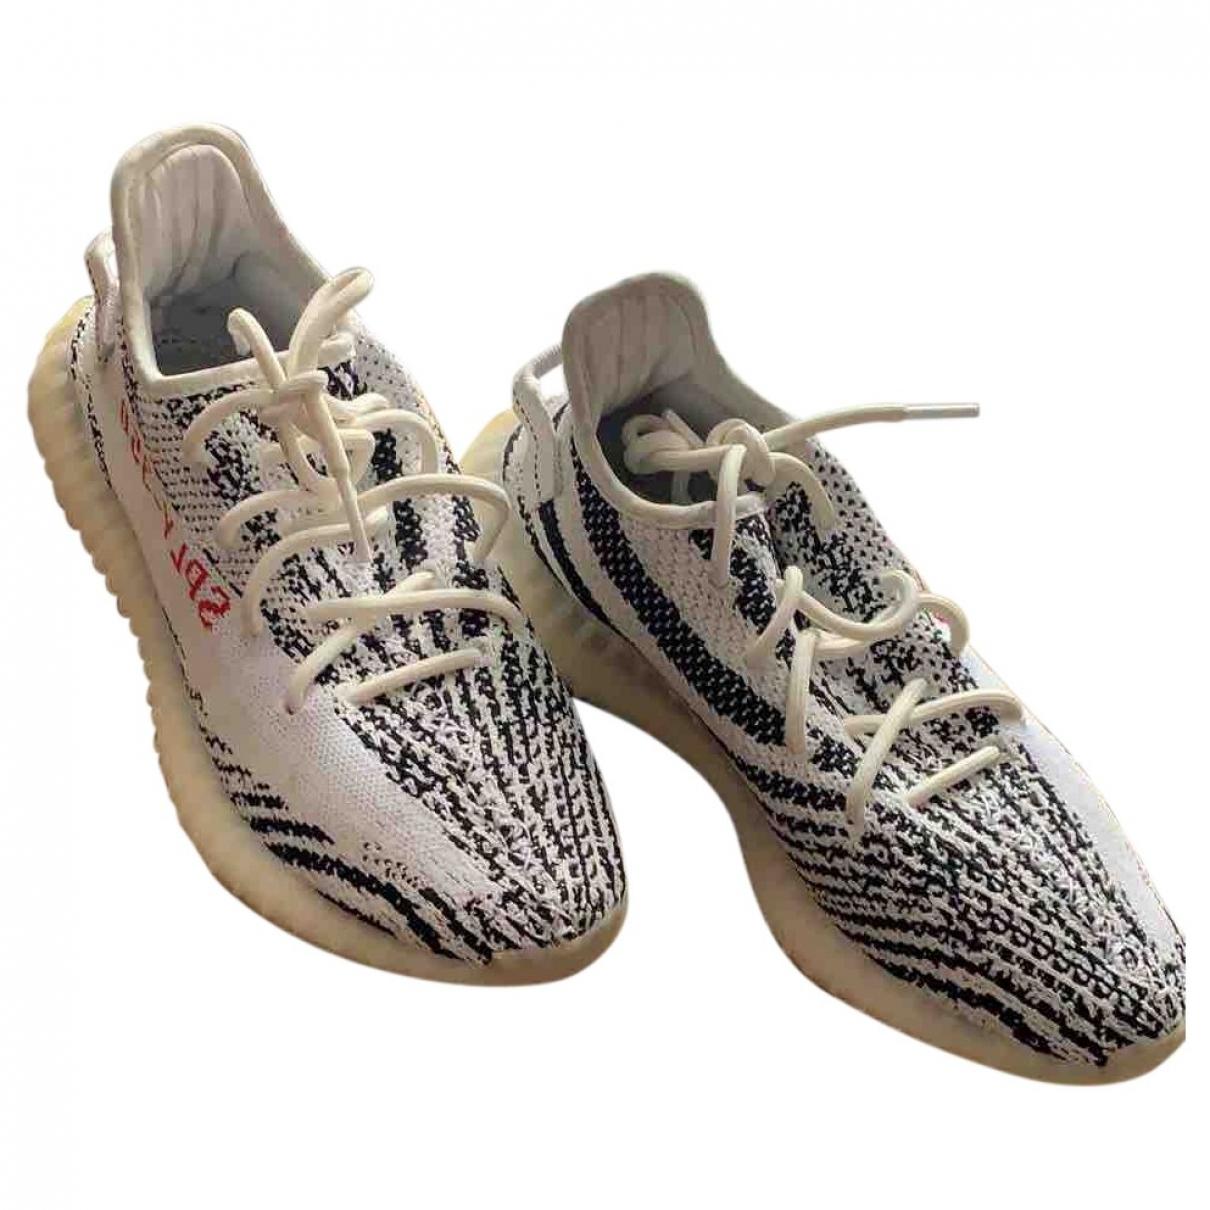 Yeezy X Adidas \N Black Cloth Trainers for Men 42 EU